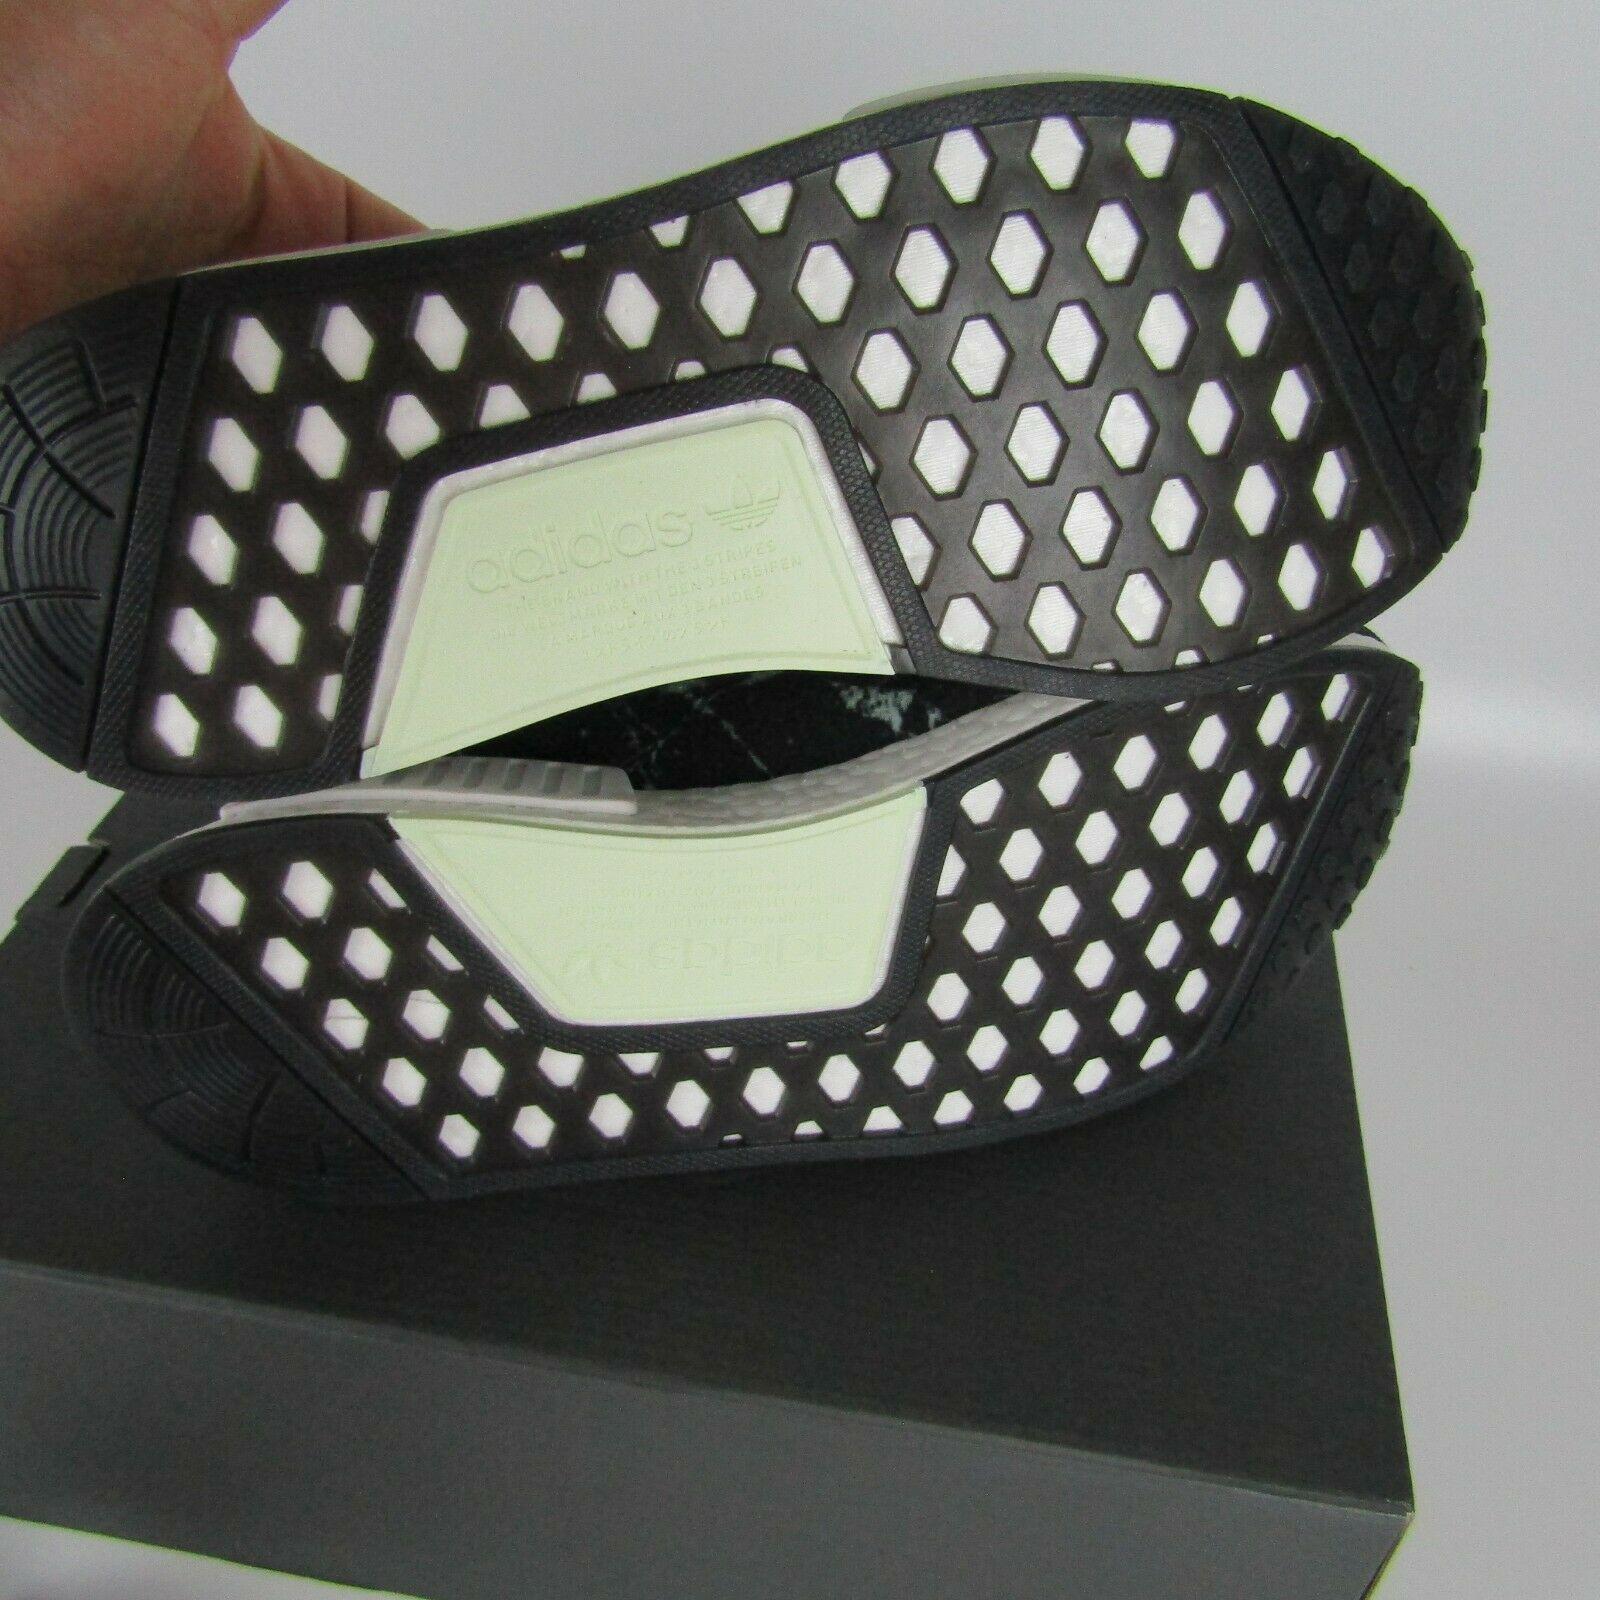 "Adidas Nmd_R1 Primeknit "" Grün Marmor "" Schuhe Herren Größe 12 BB7996 image 7"